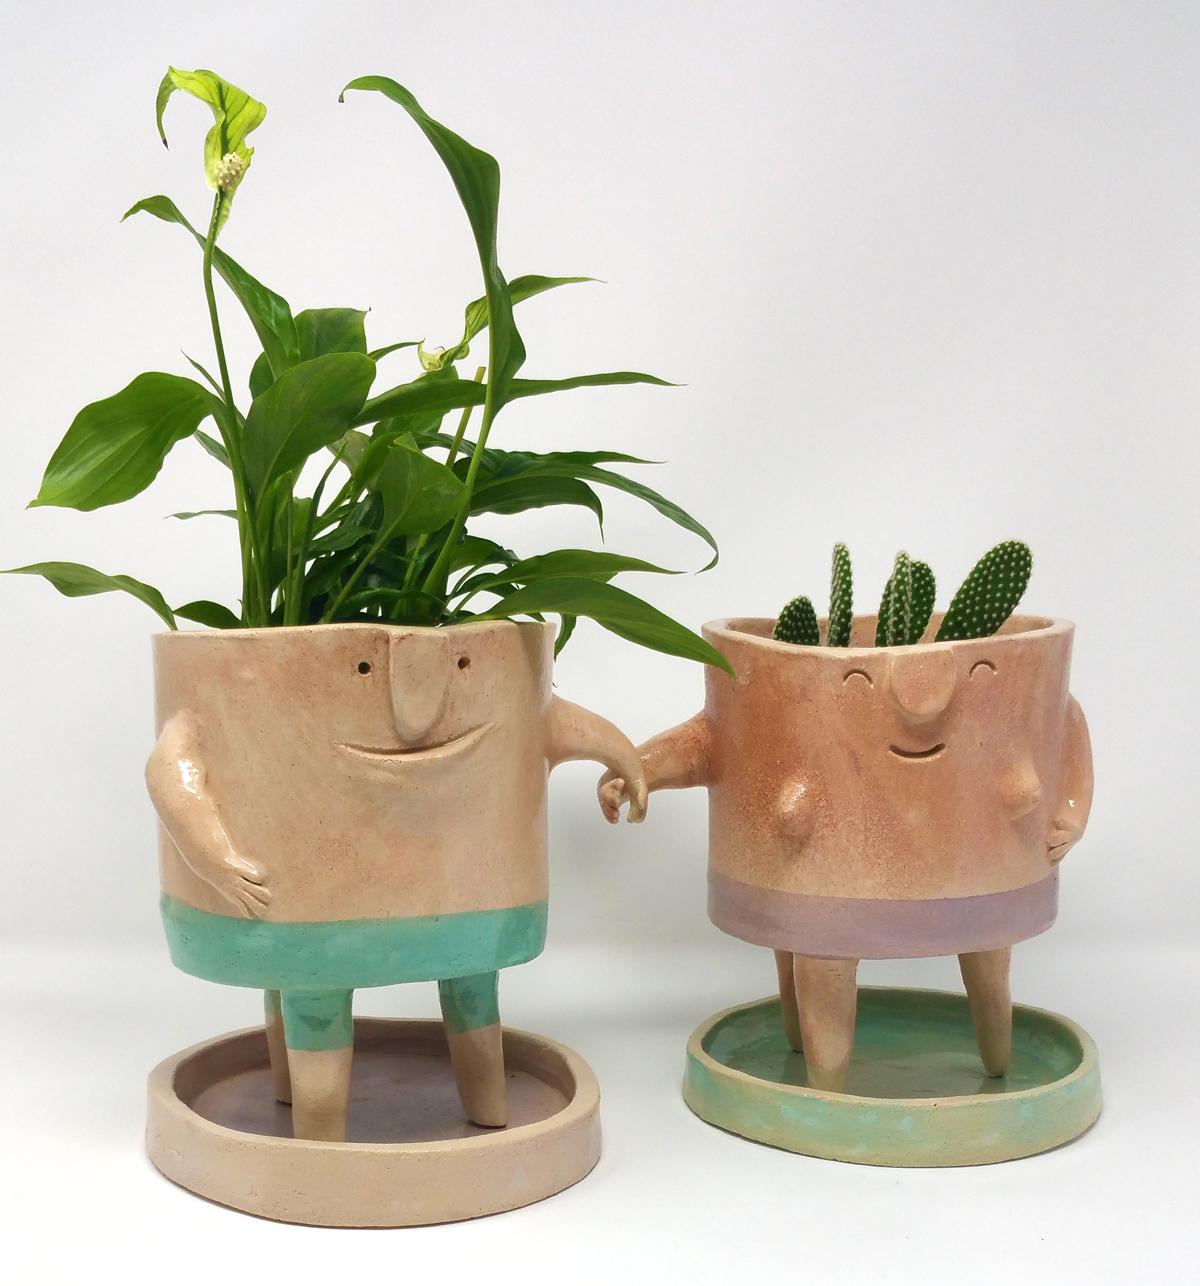 Vasi in ceramica - The TerraTiny Family - Max Schiavetta